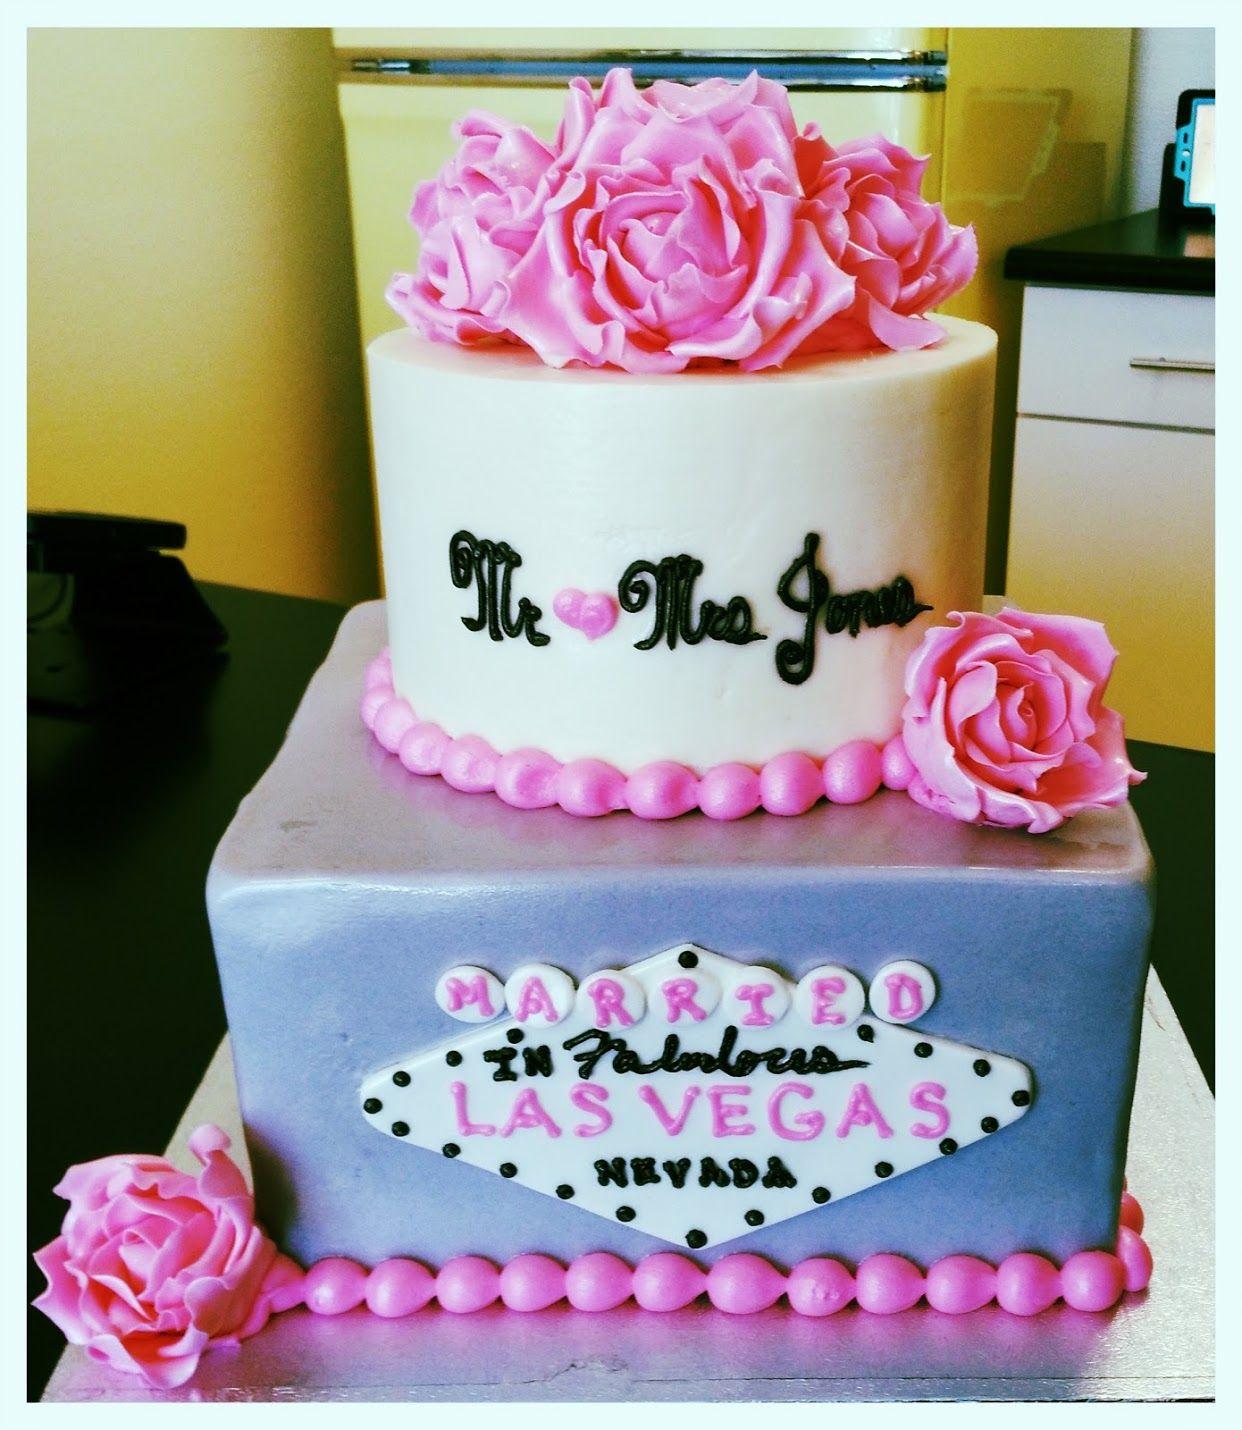 Photo in Custom Wedding Cakes and Cupcakes Google Photos